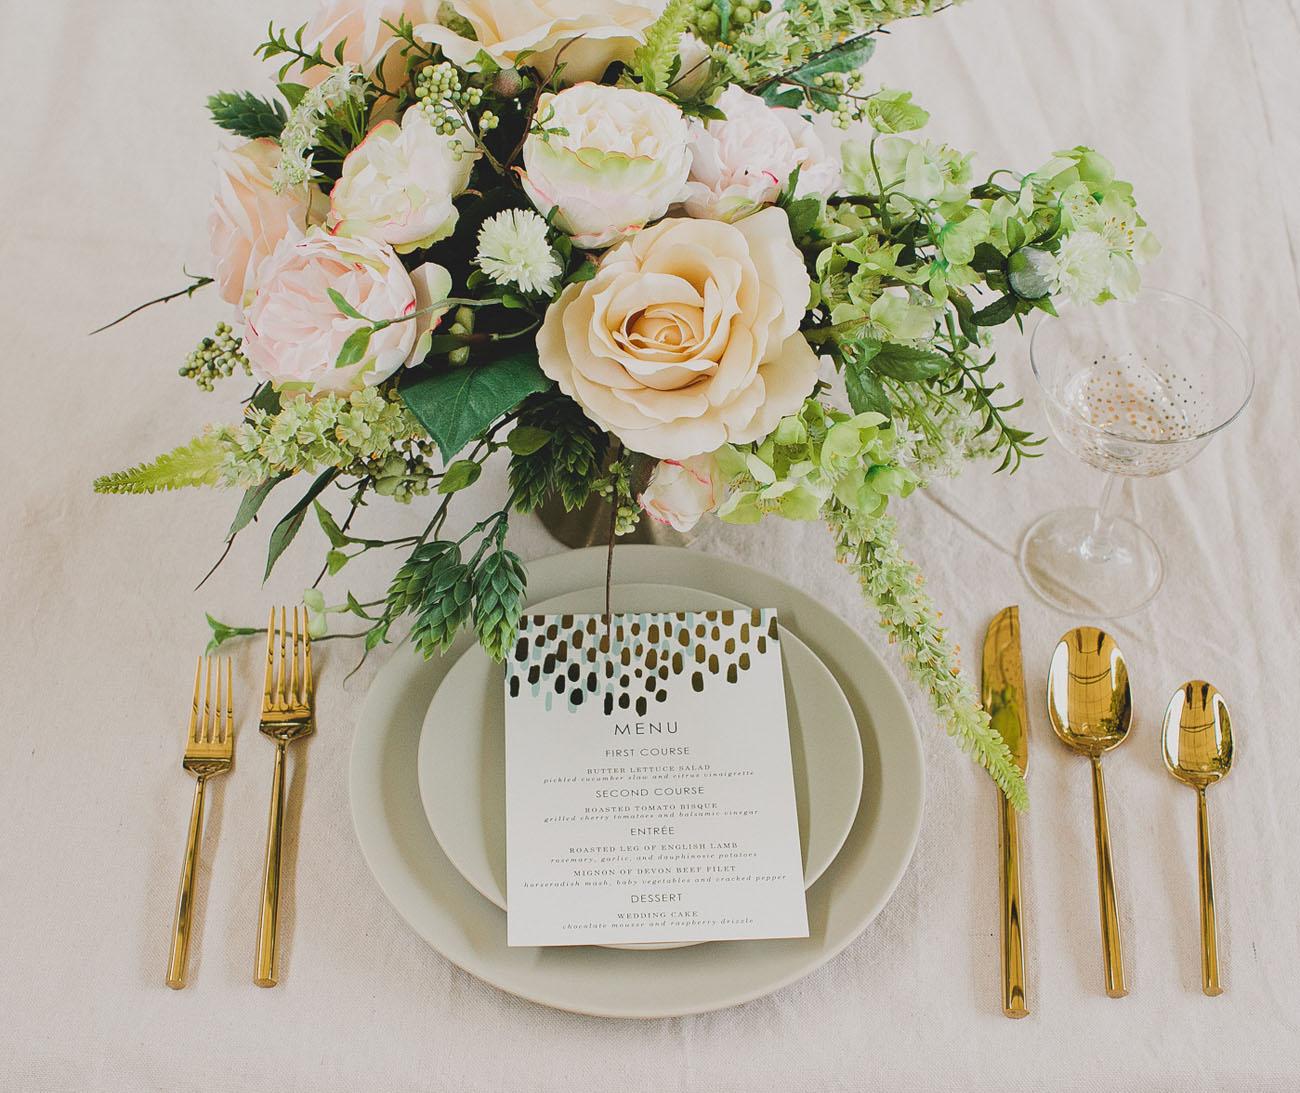 Diy Wedding Centerpieces: DIY: Silk Flower Centerpiece